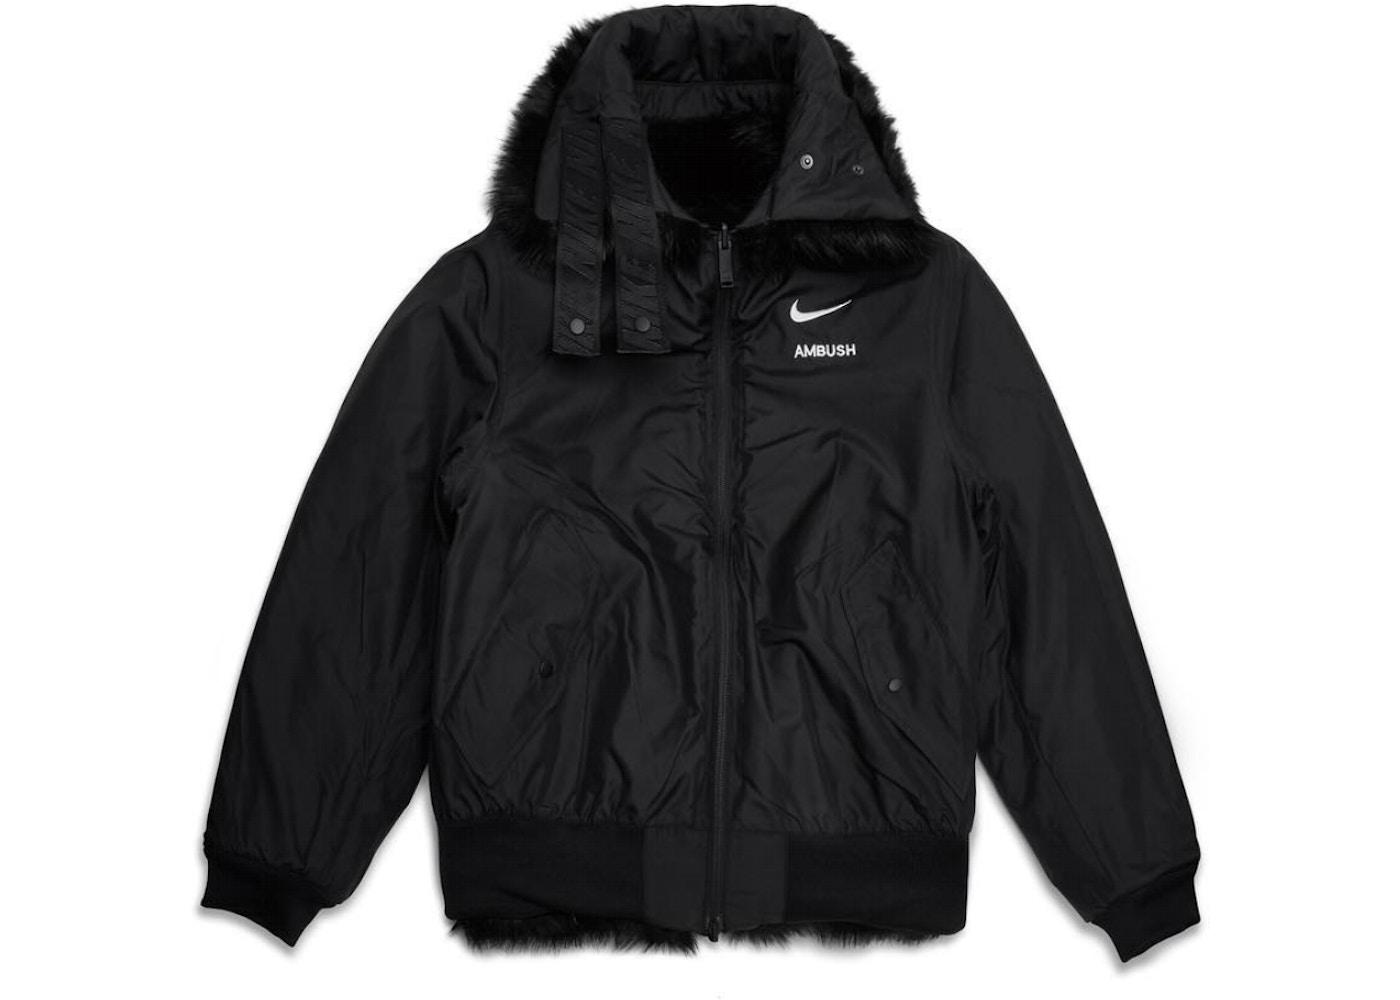 Nike x Ambush Women's Reversible Faux Fur Coat Black/Sail ...